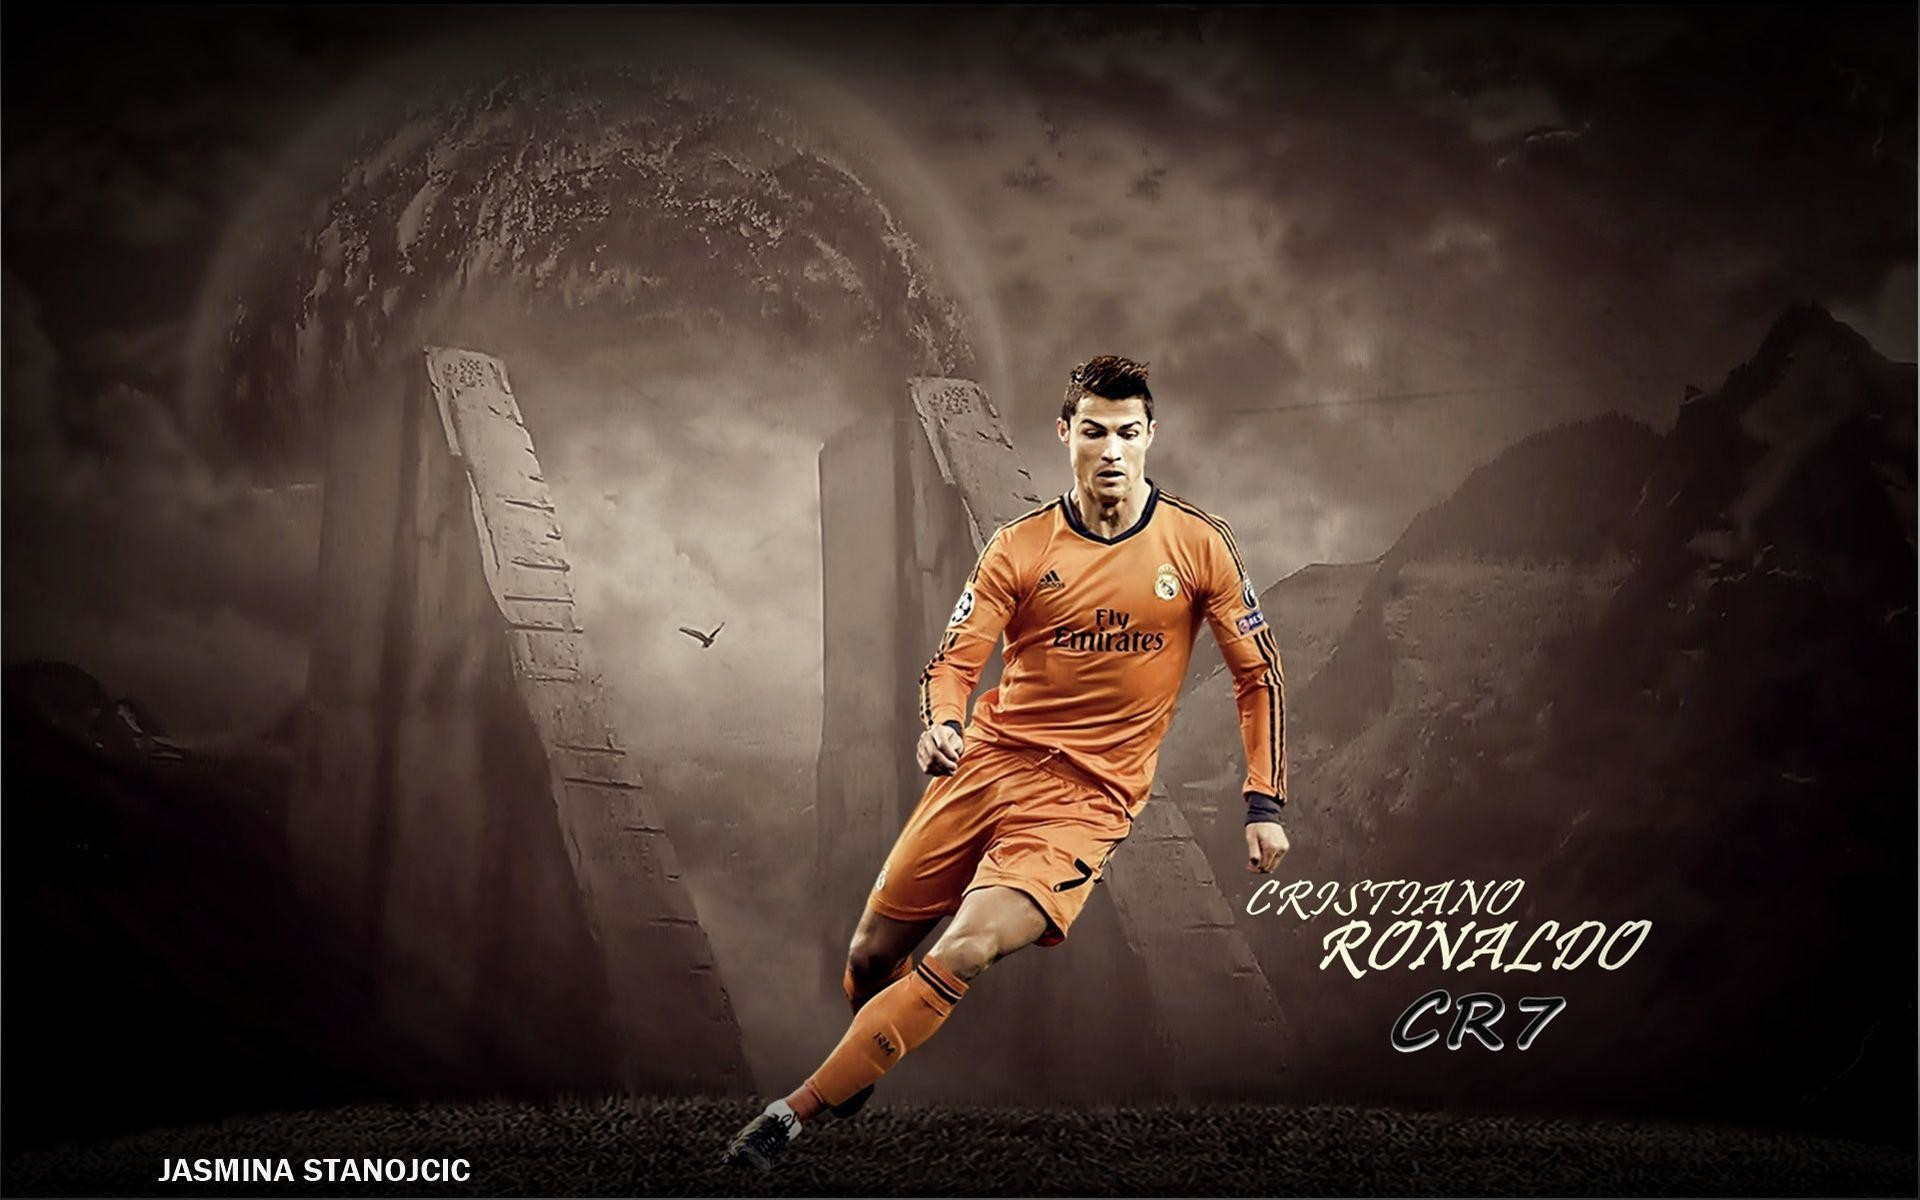 Cristiano Ronaldo Wallpapers – CR7 HD Wallpaper